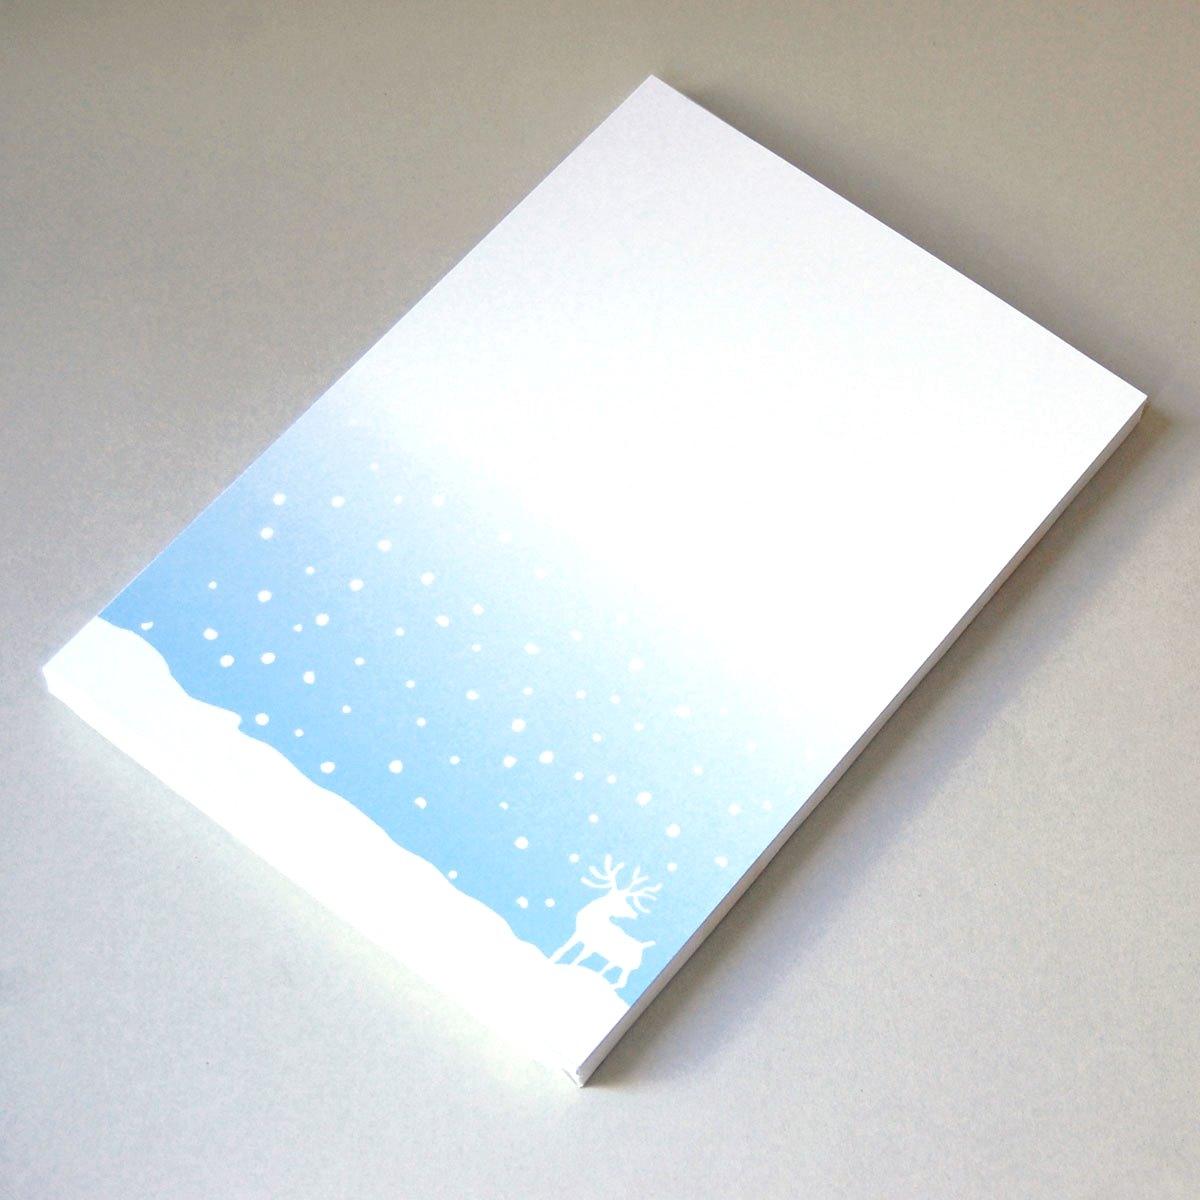 design weihnachts briefpapier grit may wolff elch. Black Bedroom Furniture Sets. Home Design Ideas